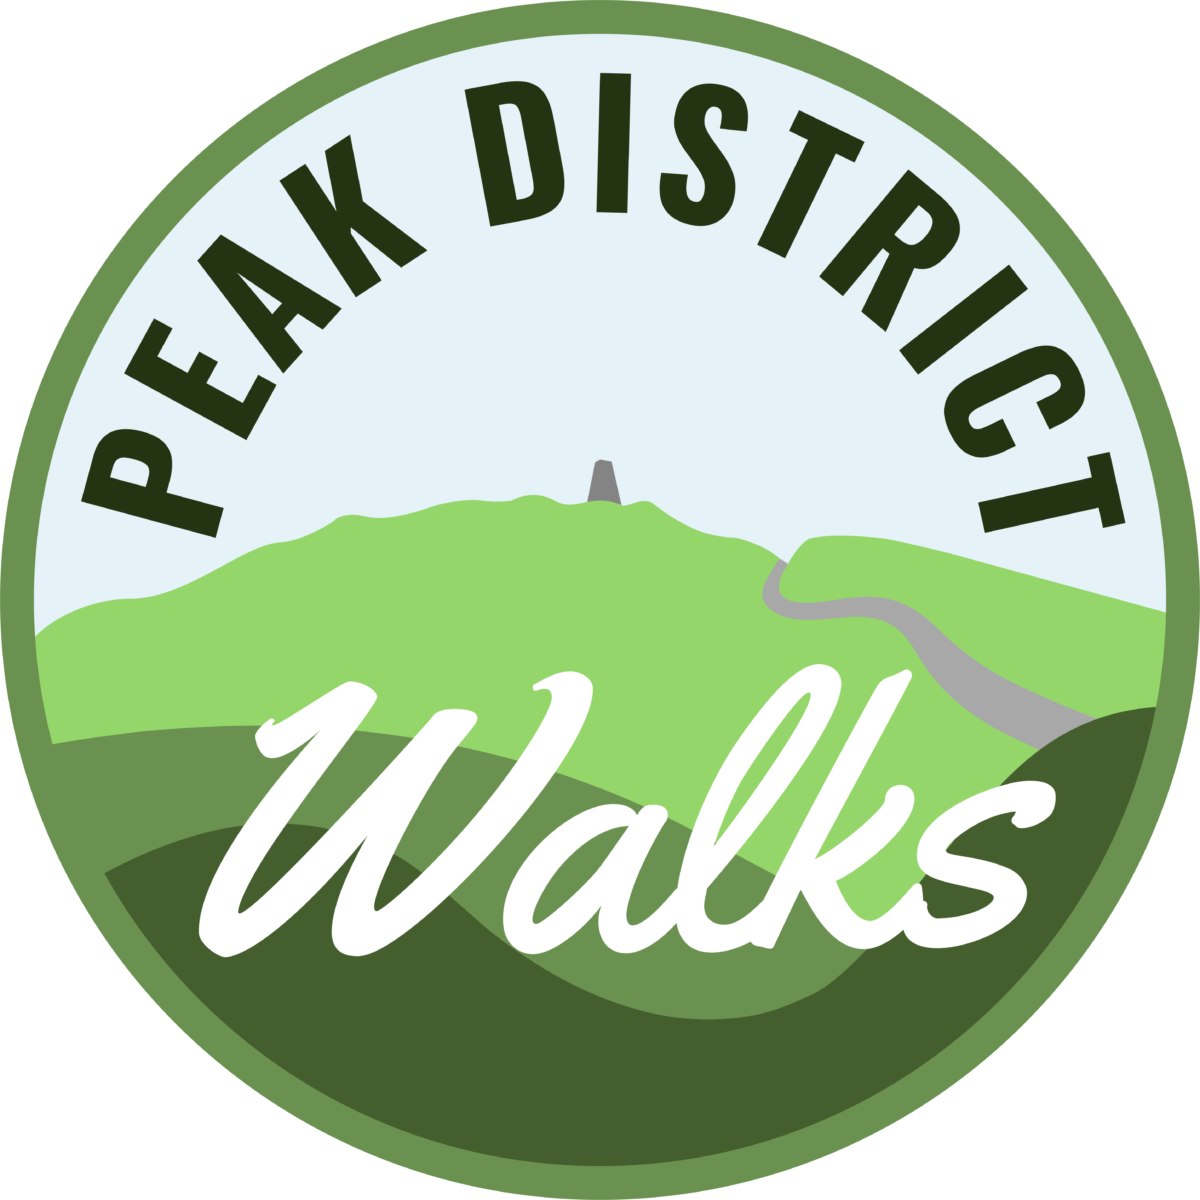 Peak District Walks